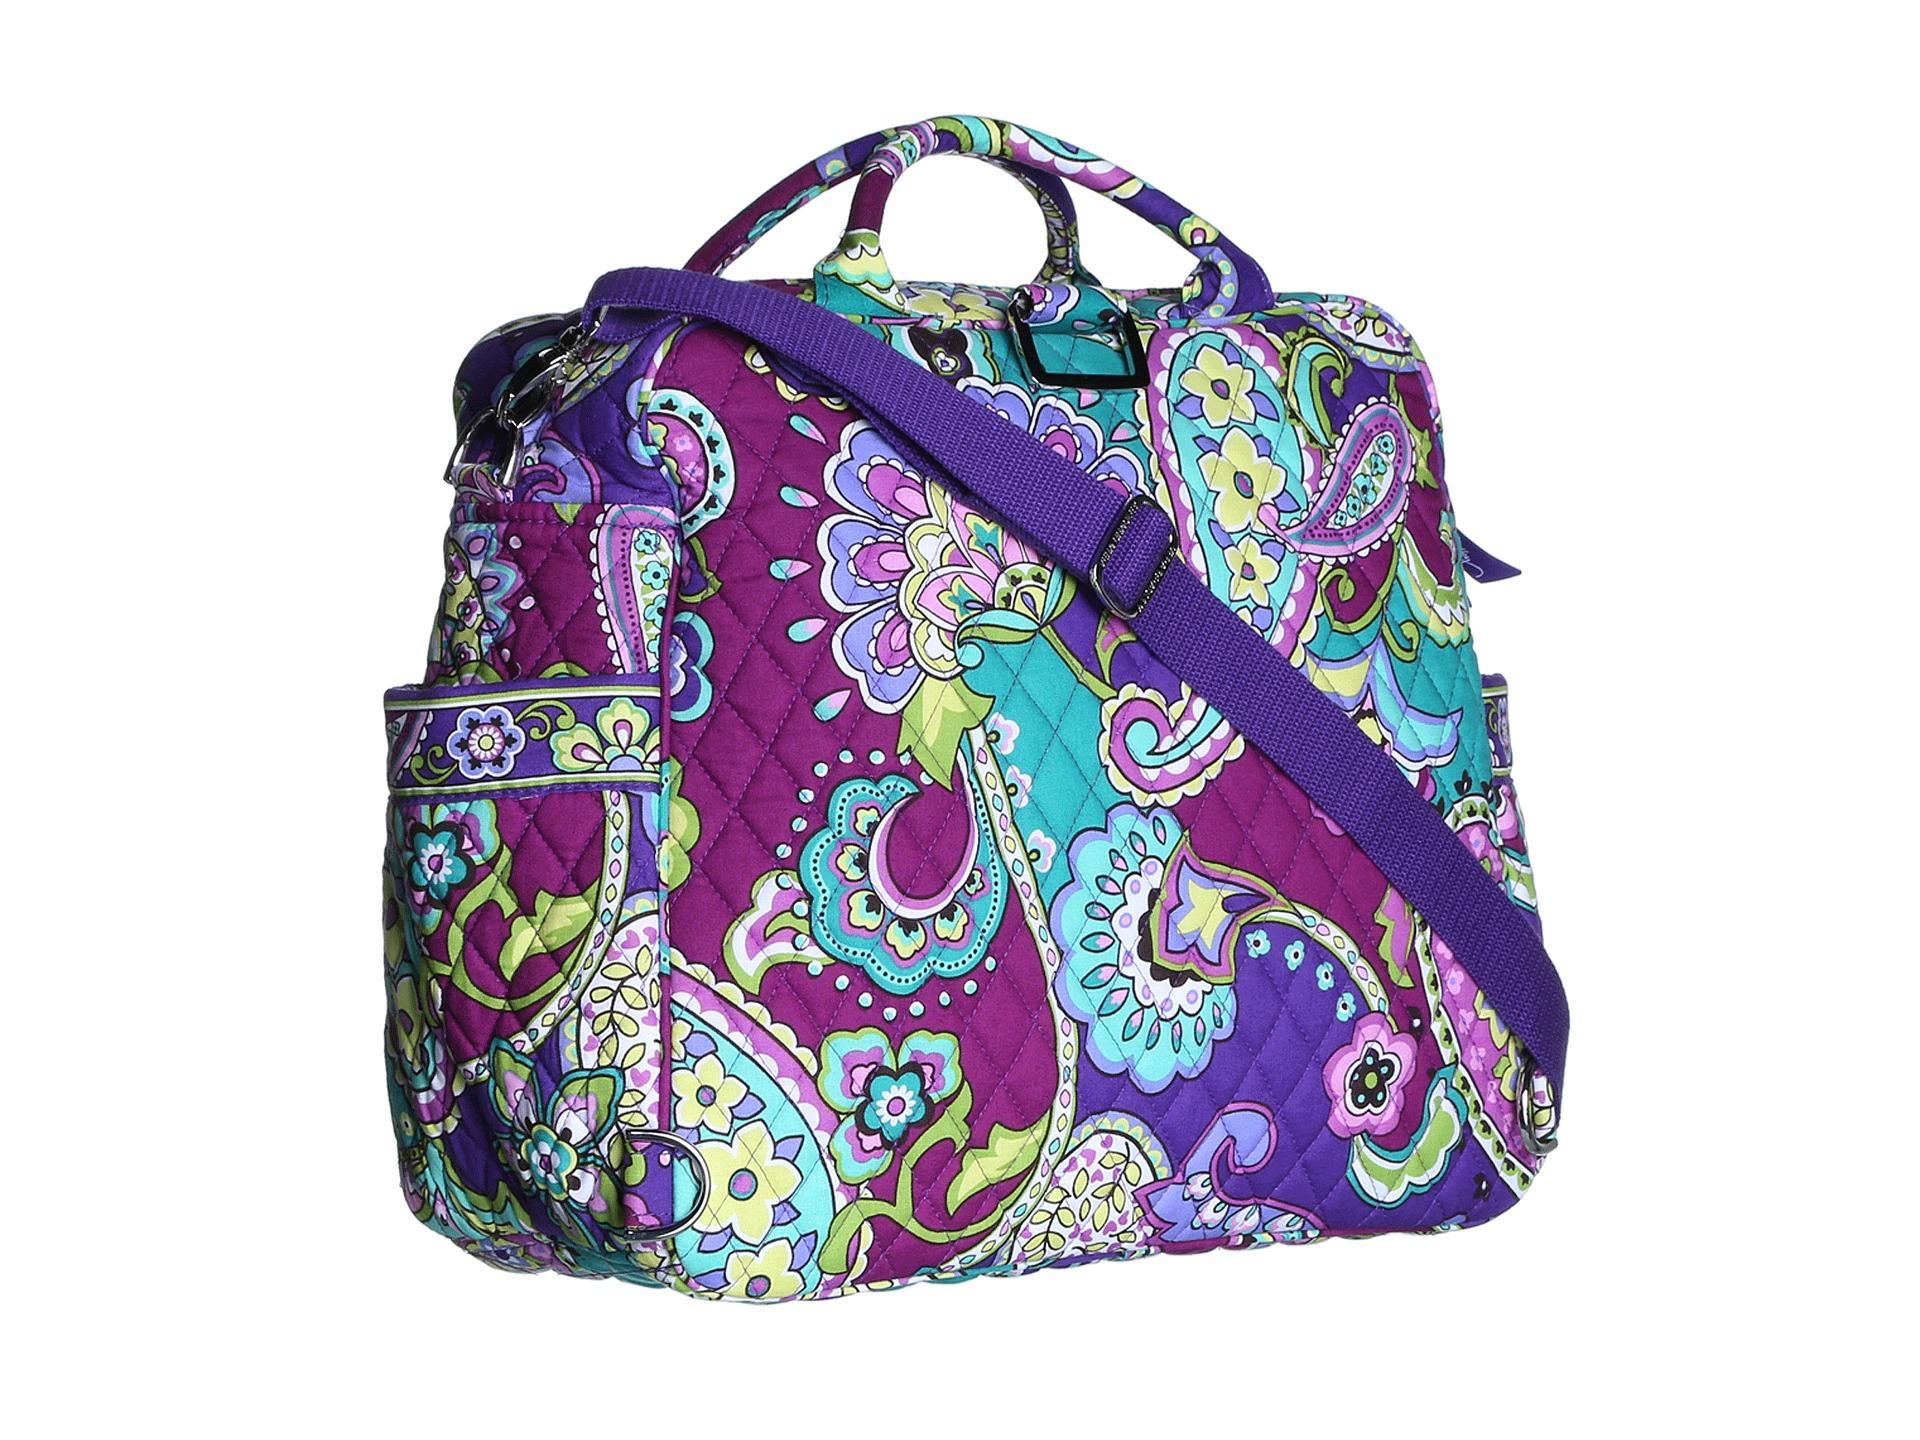 vera bradley handbags vera bradley outlet baby bag. Black Bedroom Furniture Sets. Home Design Ideas